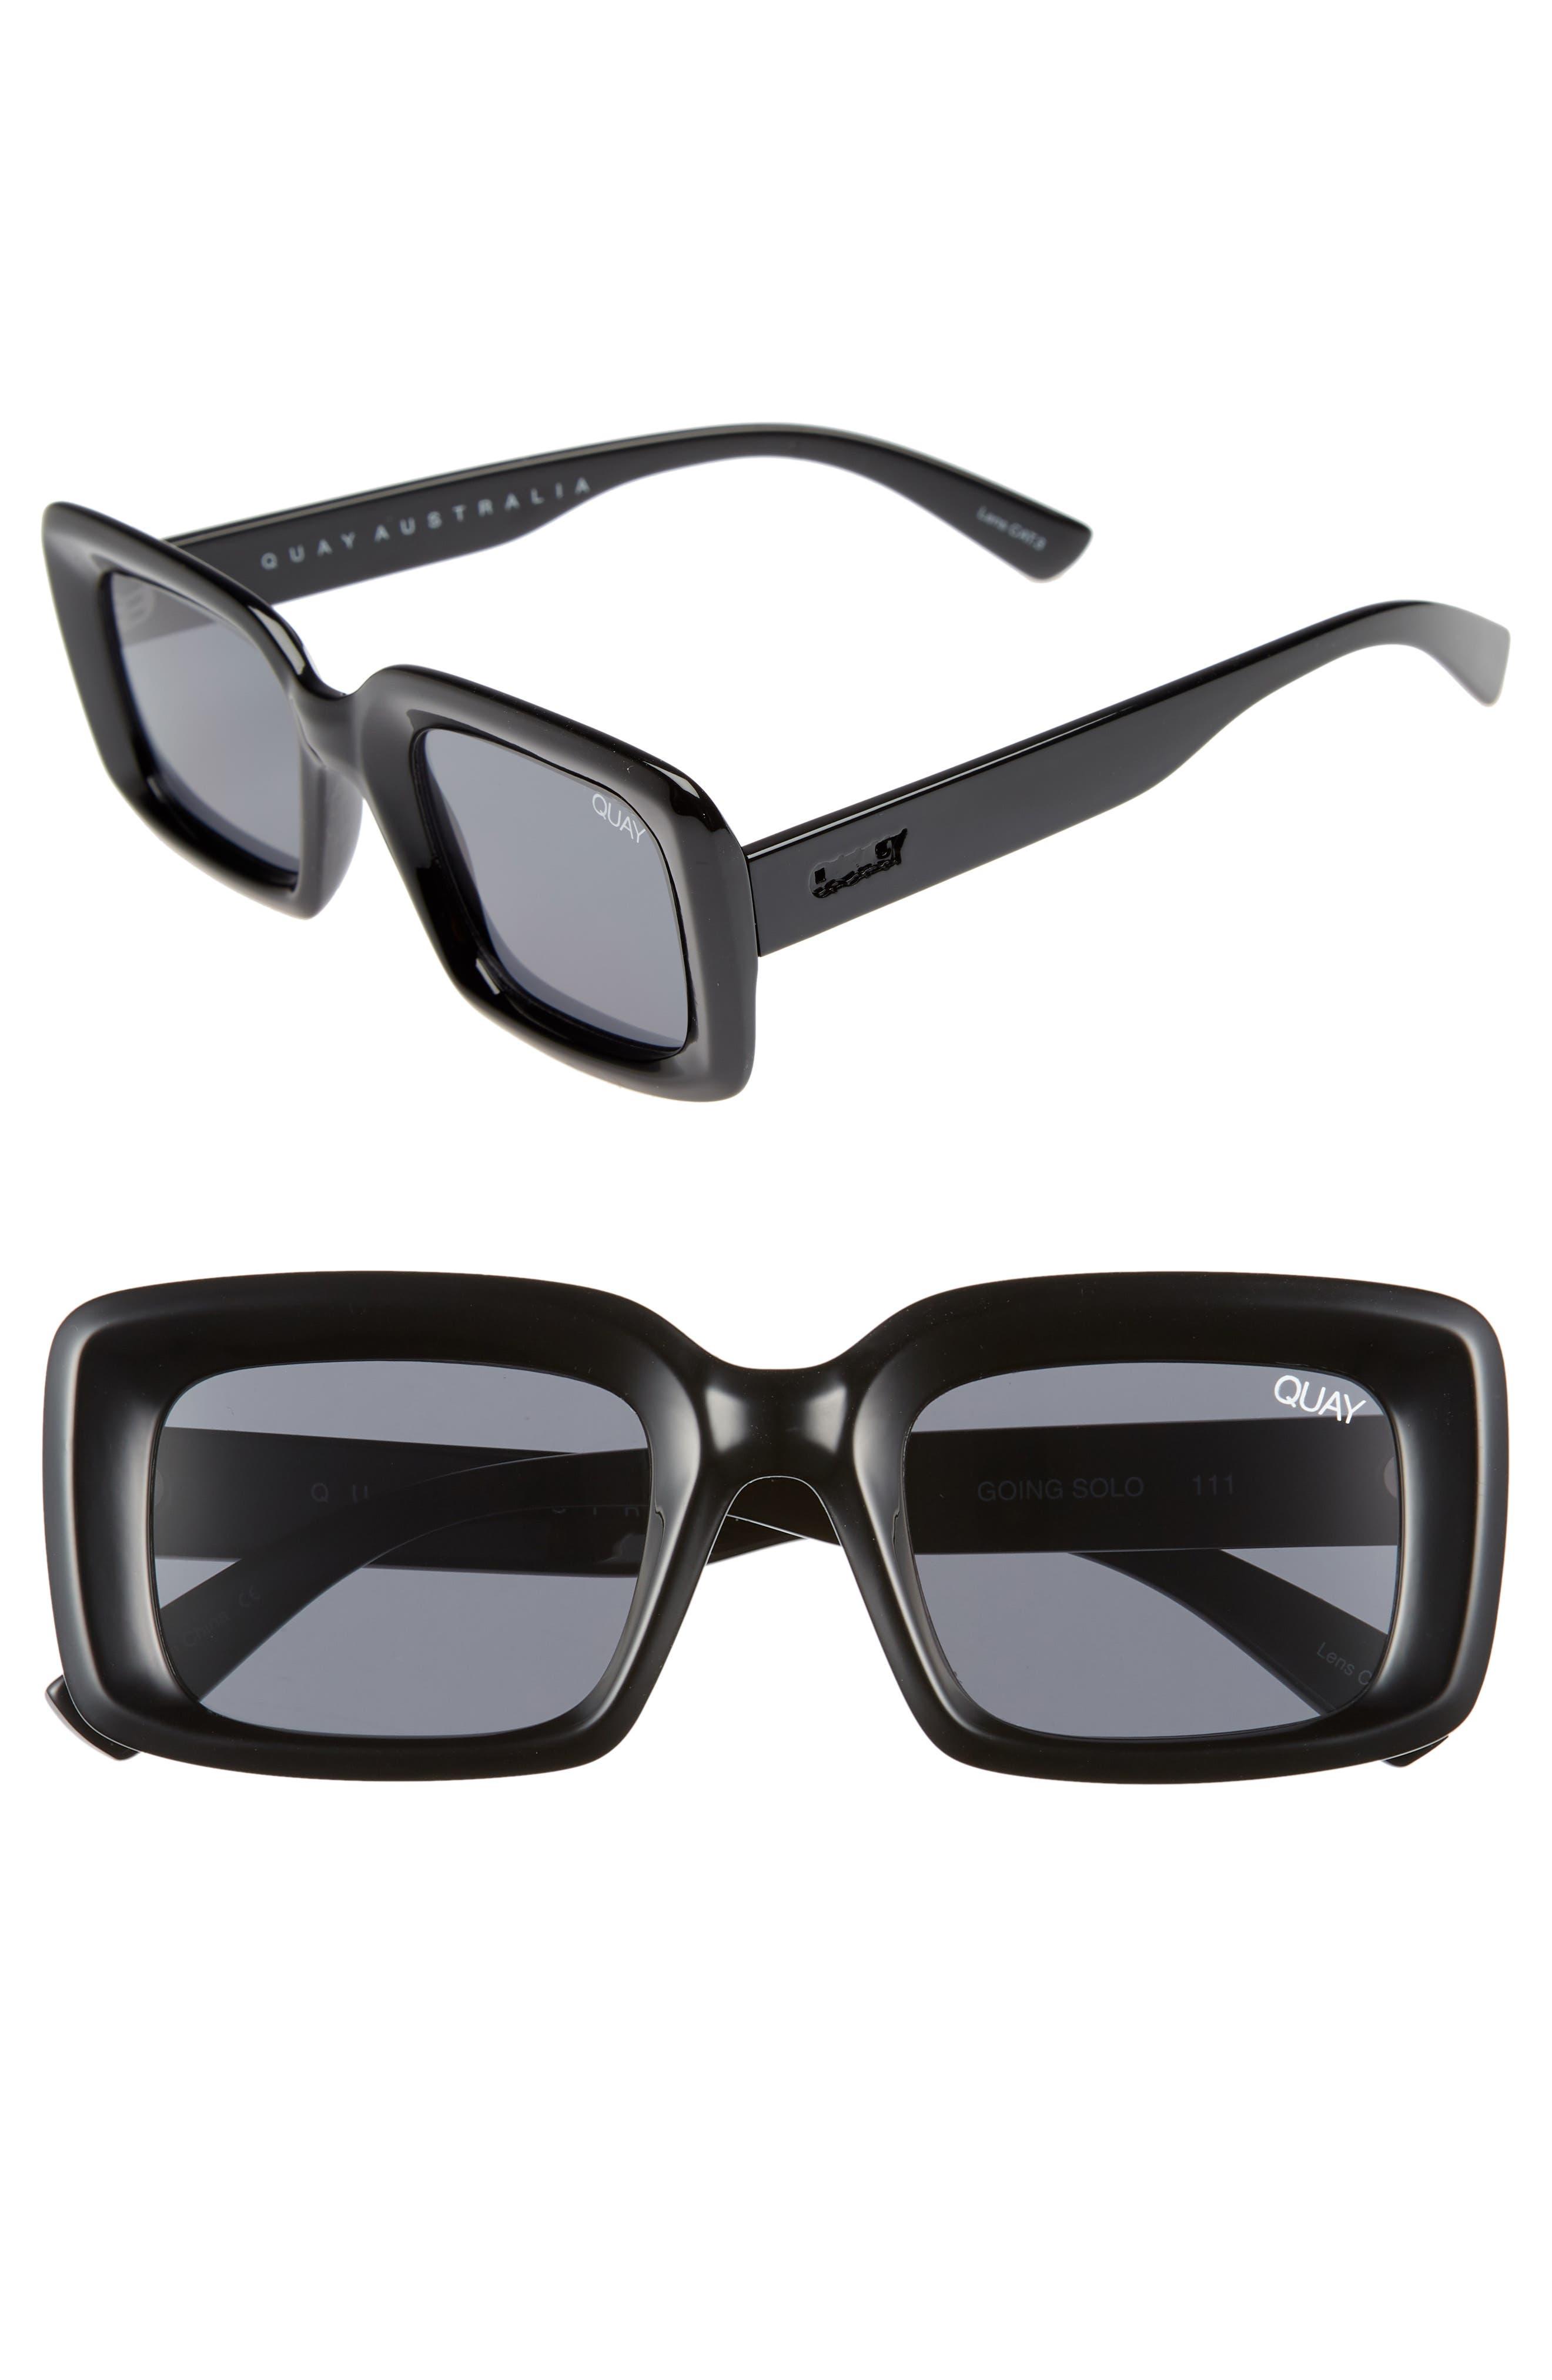 Going Solo 48mm Square Sunglasses,                             Main thumbnail 1, color,                             BLACK/ SMOKE